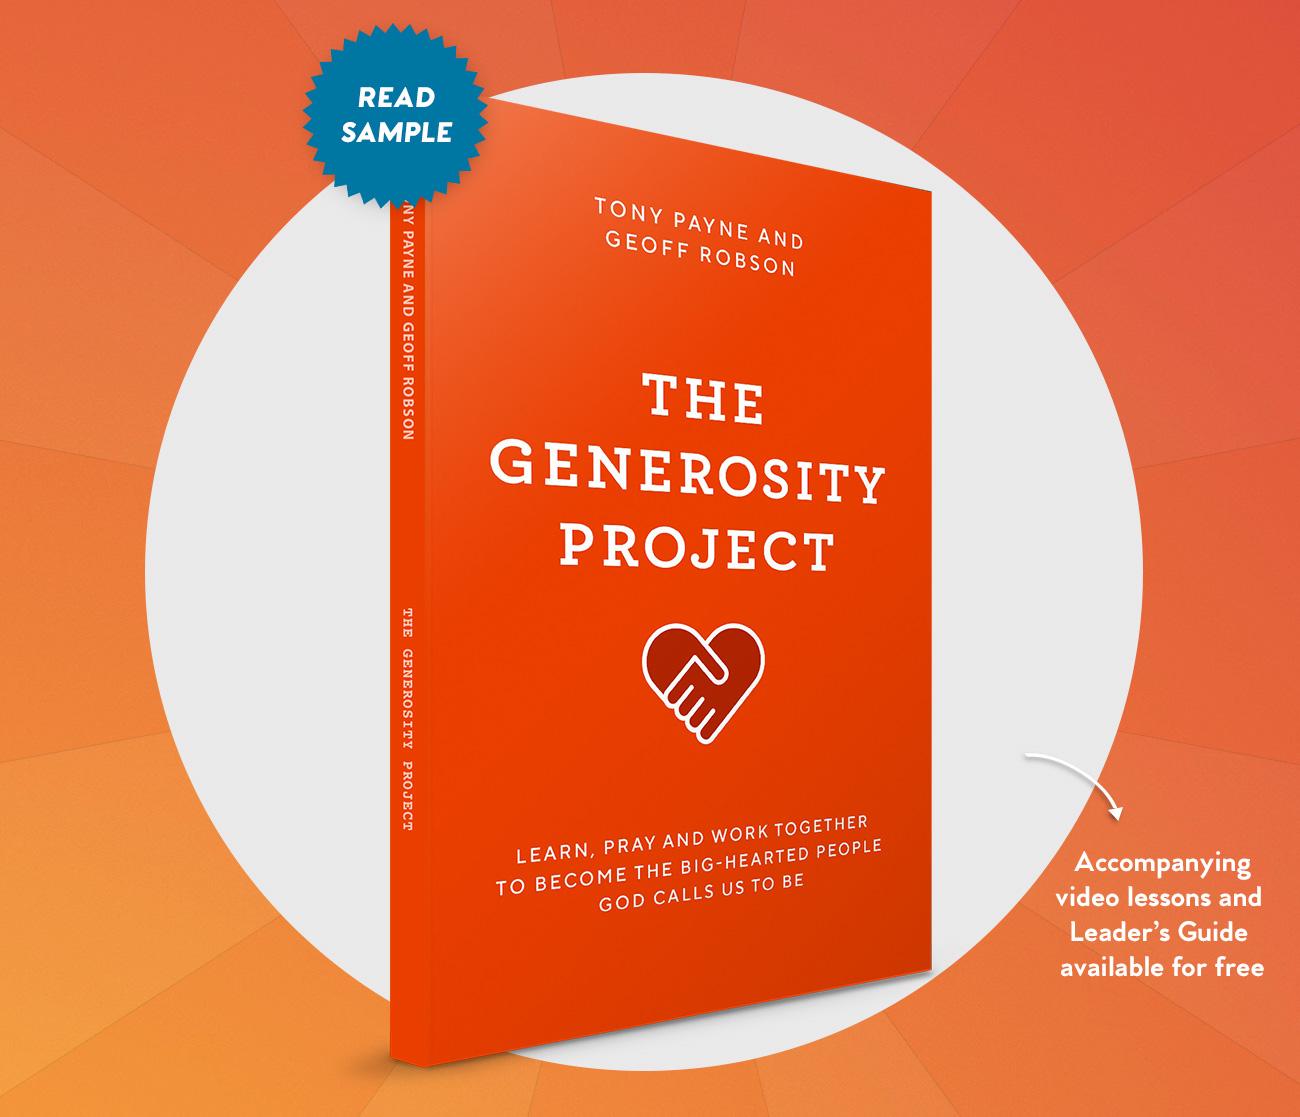 The Generosity Project - Sample